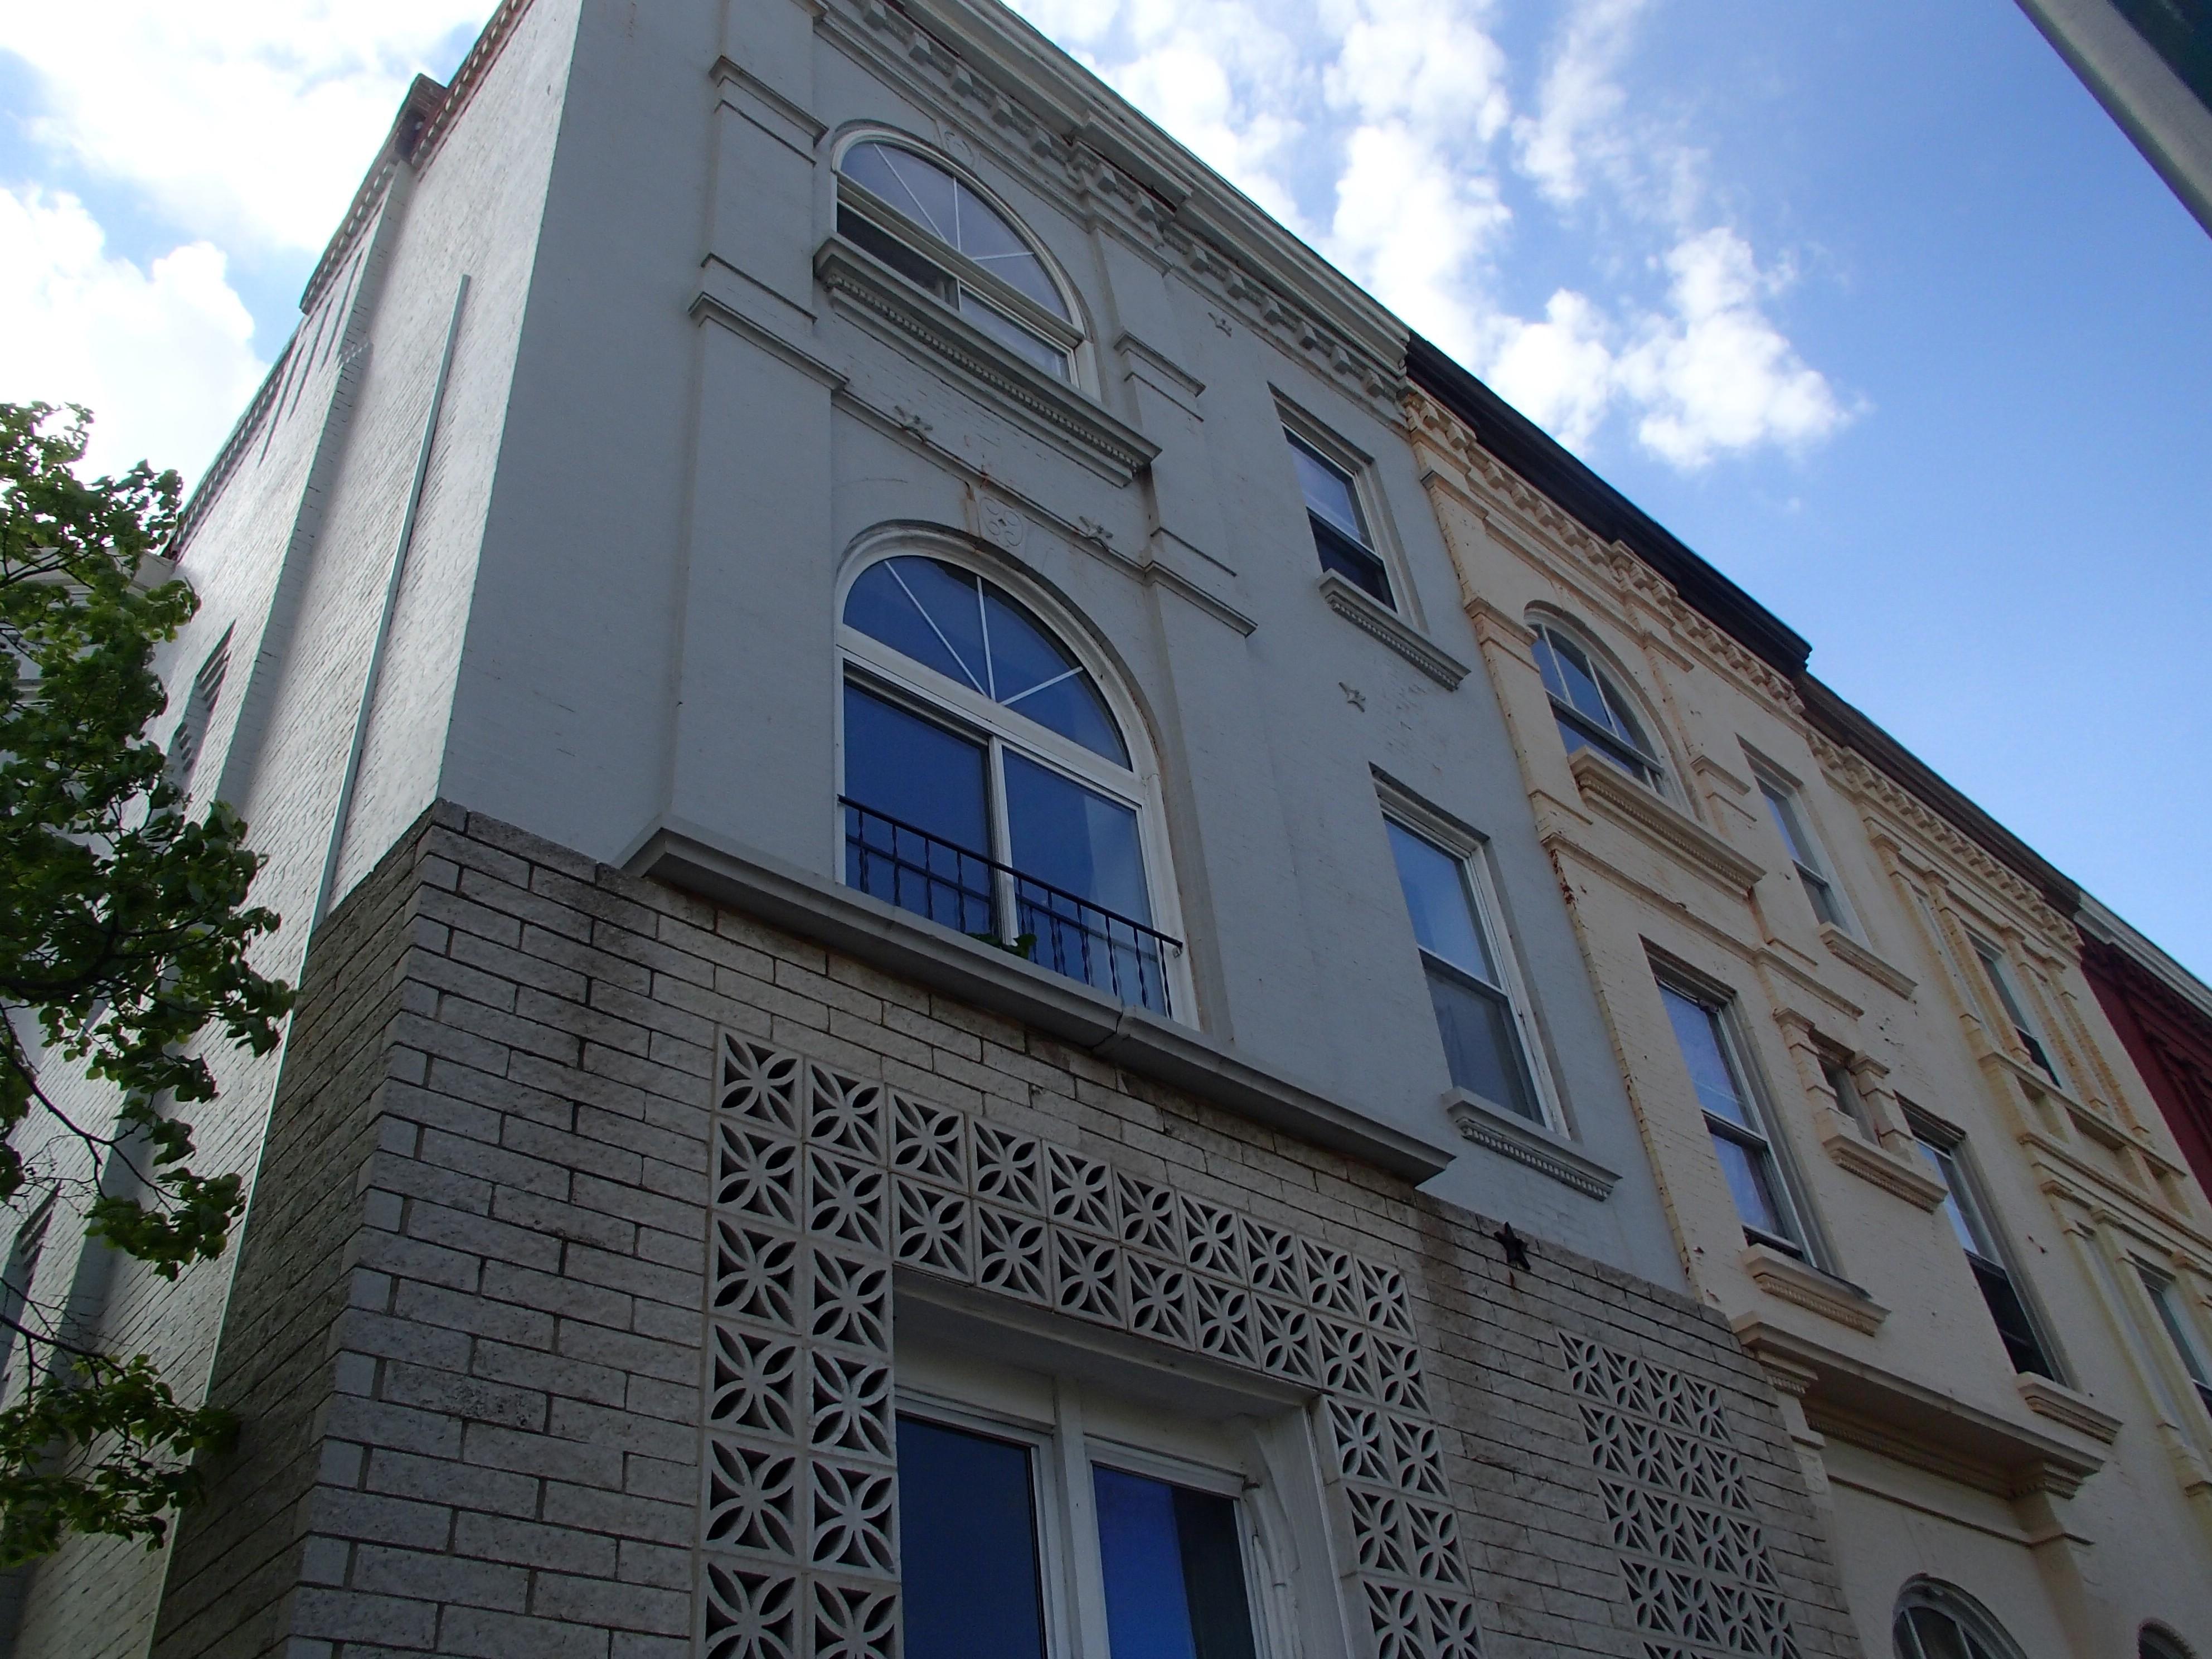 2233 saint paul street baltimore md 21218 studio apartment for rent for 750 month zumper